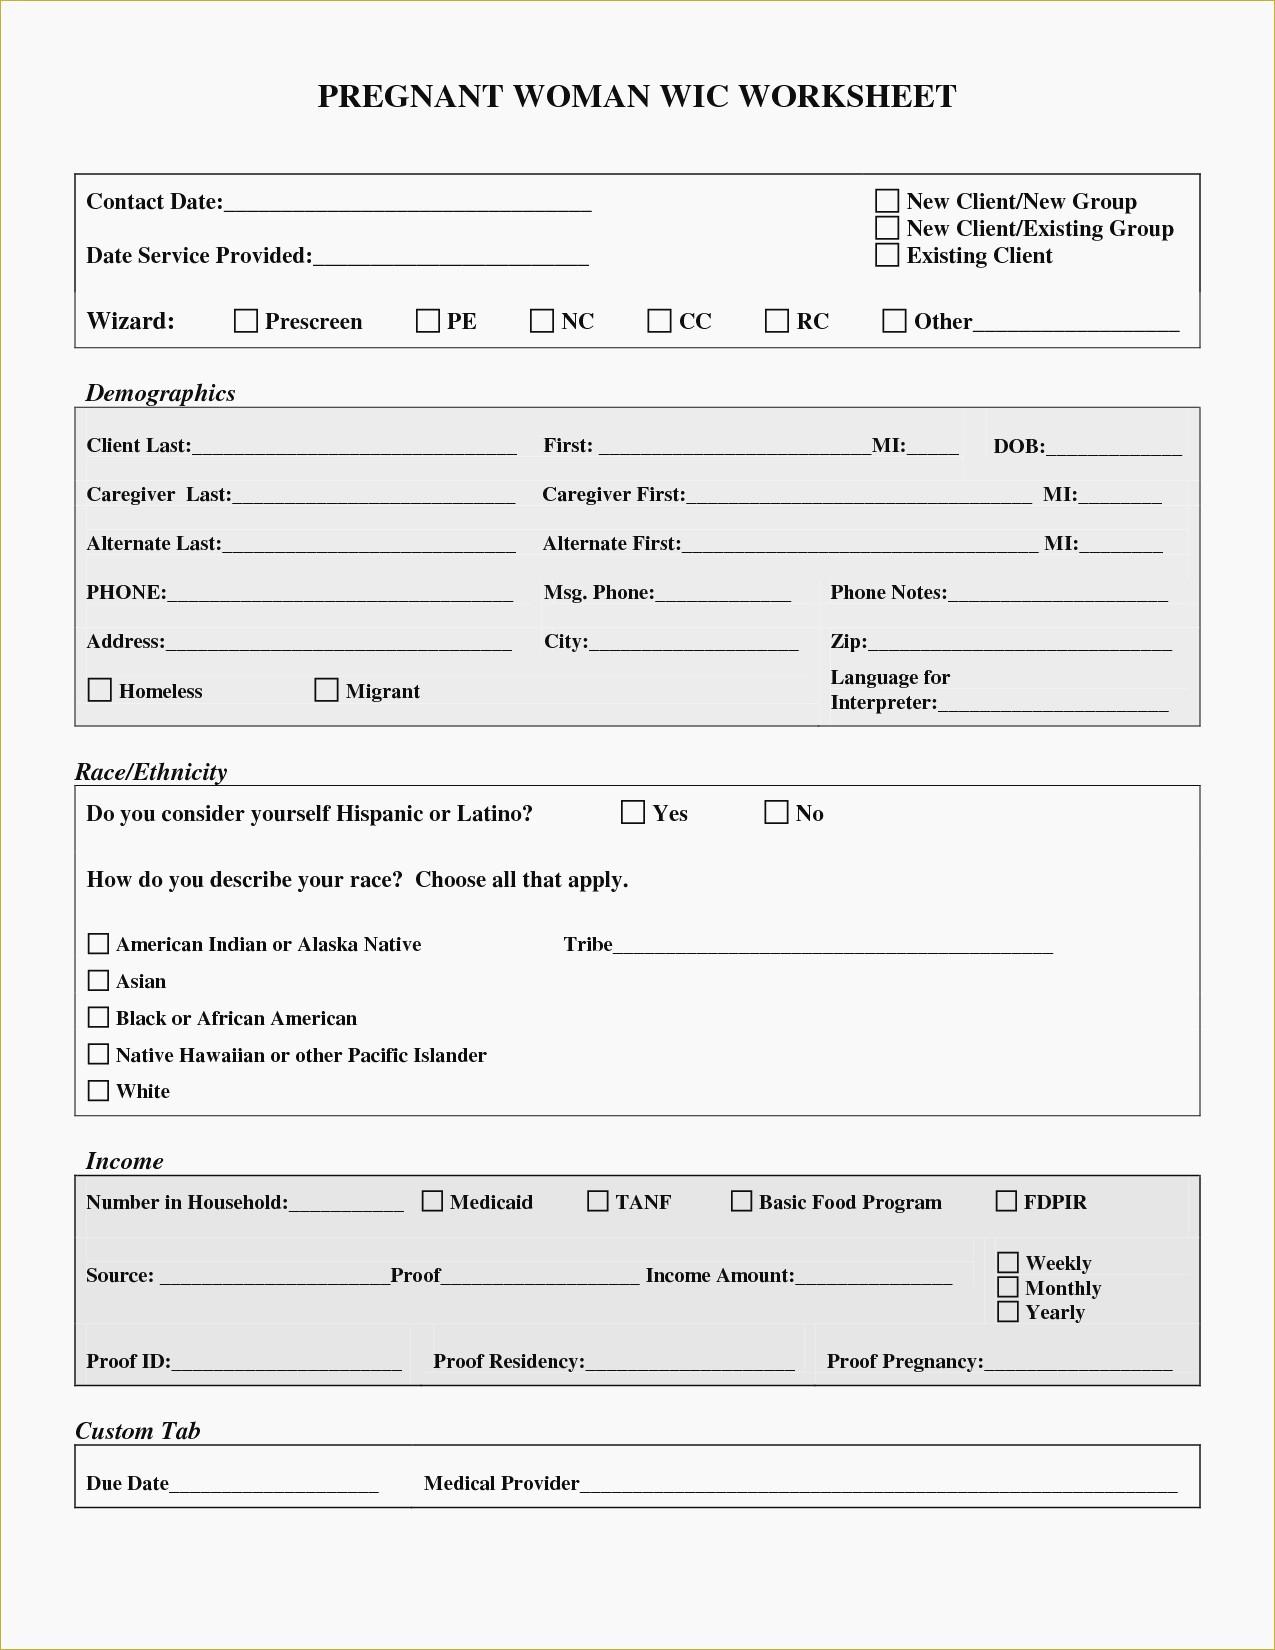 Free Printable Fake Pregnancy Papers Fresh Hospital Discharge - Free Printable Fake Pregnancy Papers